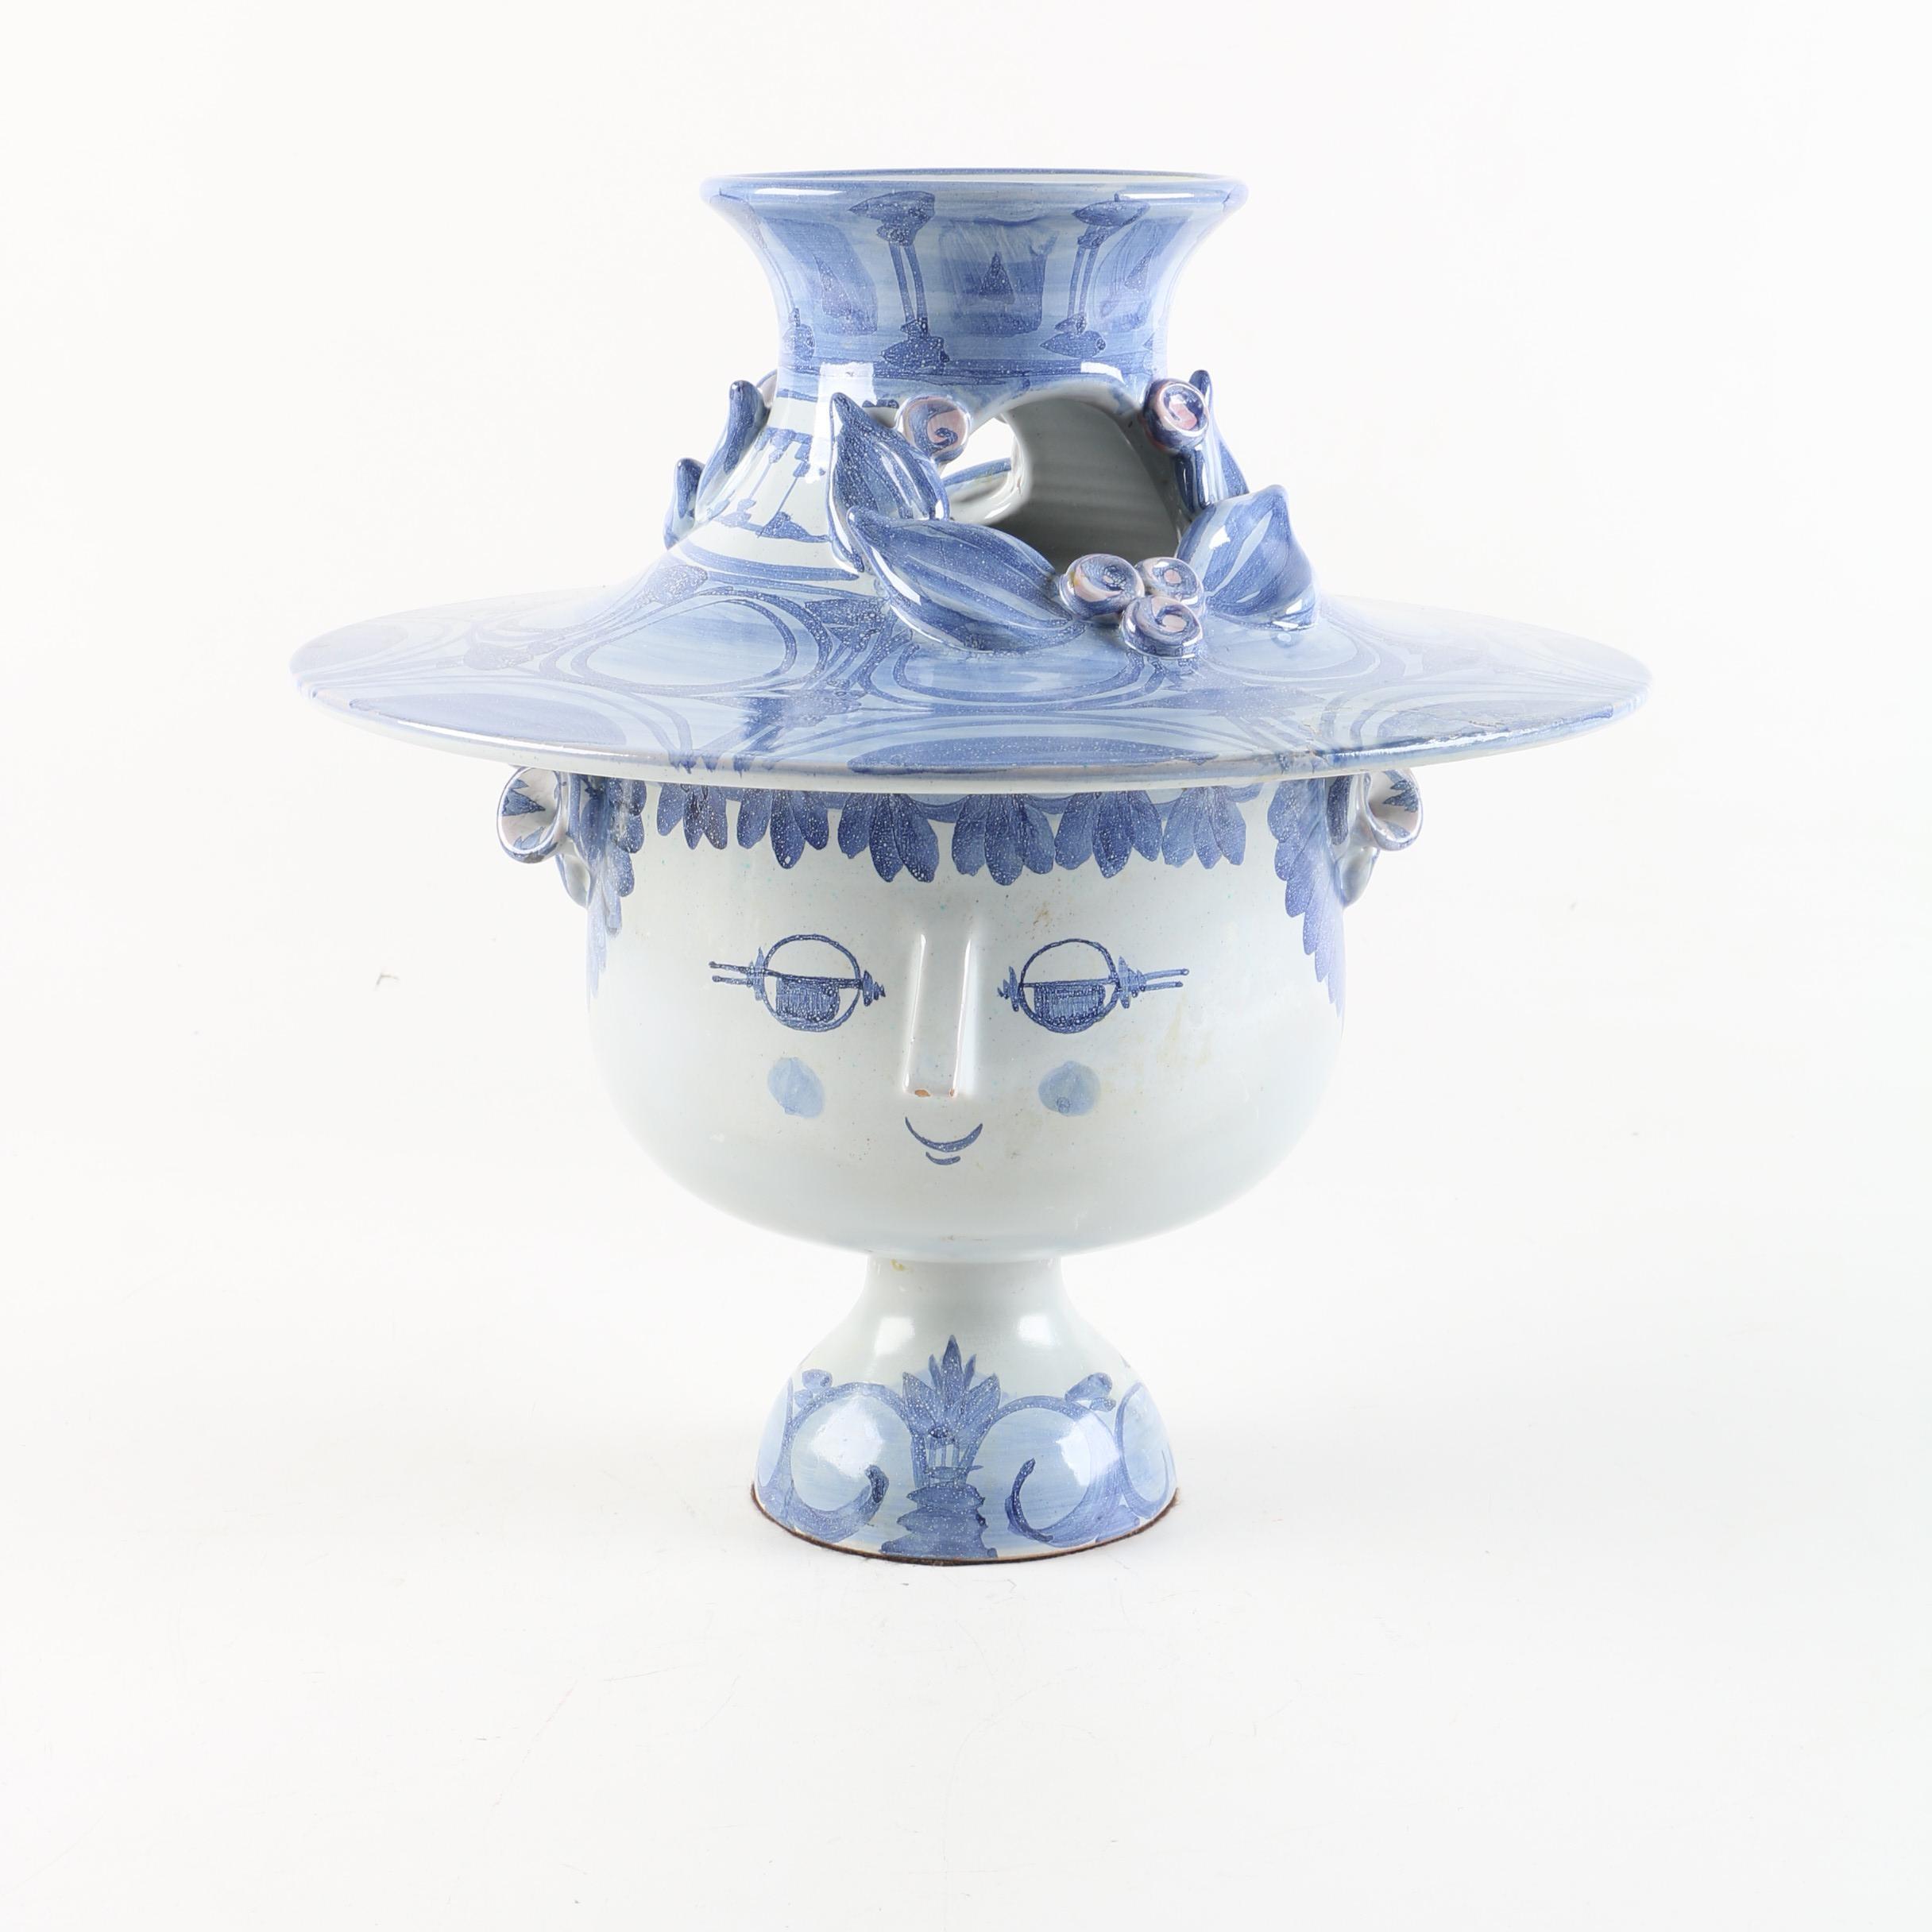 Bjørn Wiinblad Danish Figural Art Pottery Vase, Circa 1970s